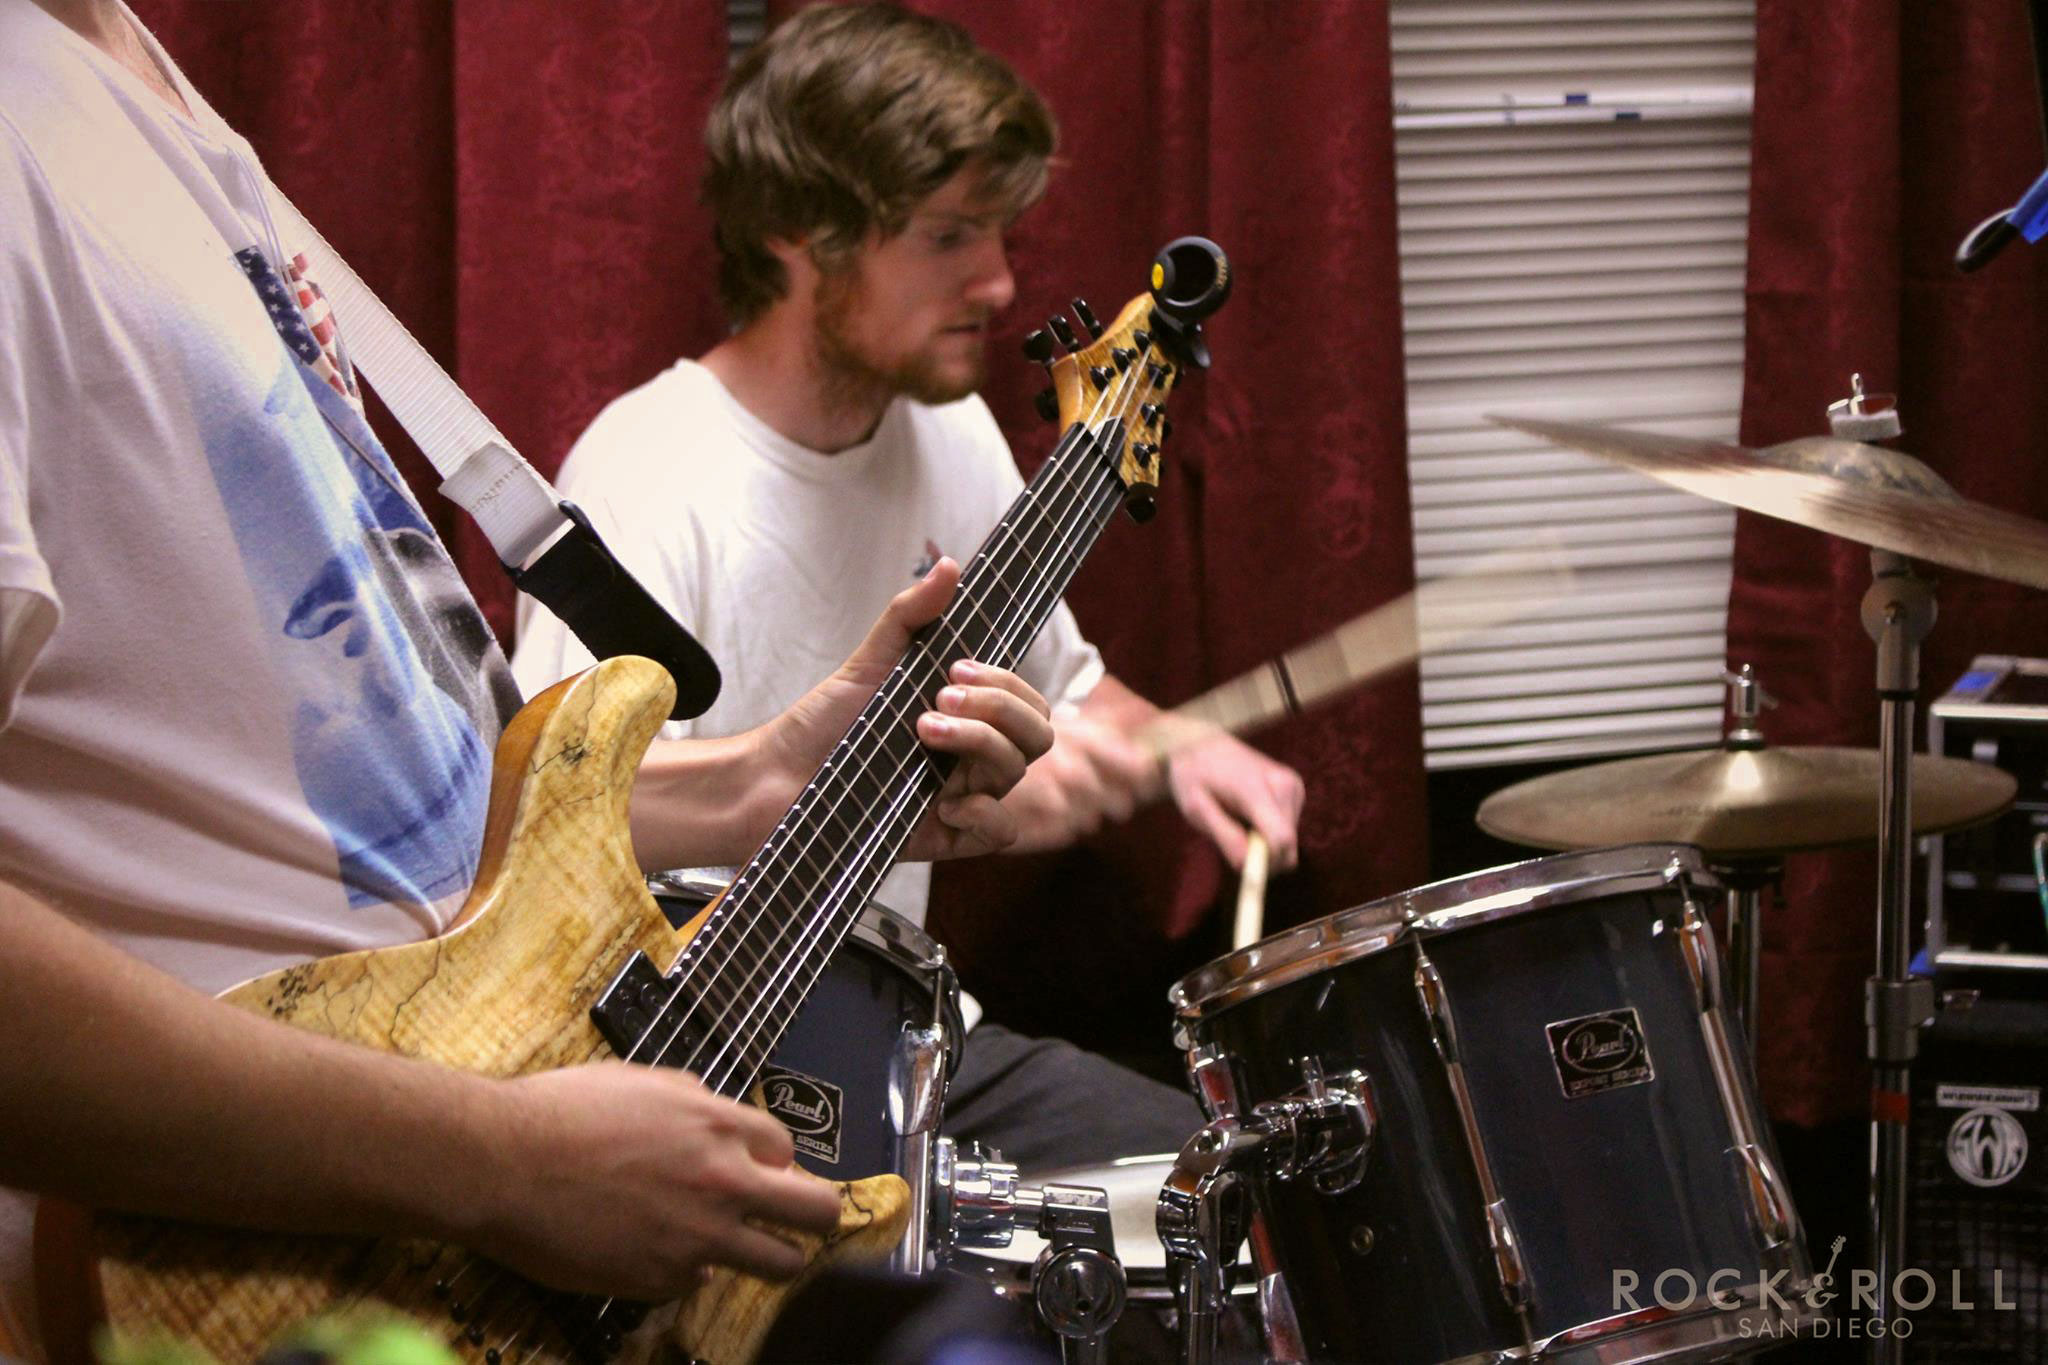 RockandRollSanDiego-RehearsalRooms.jpg